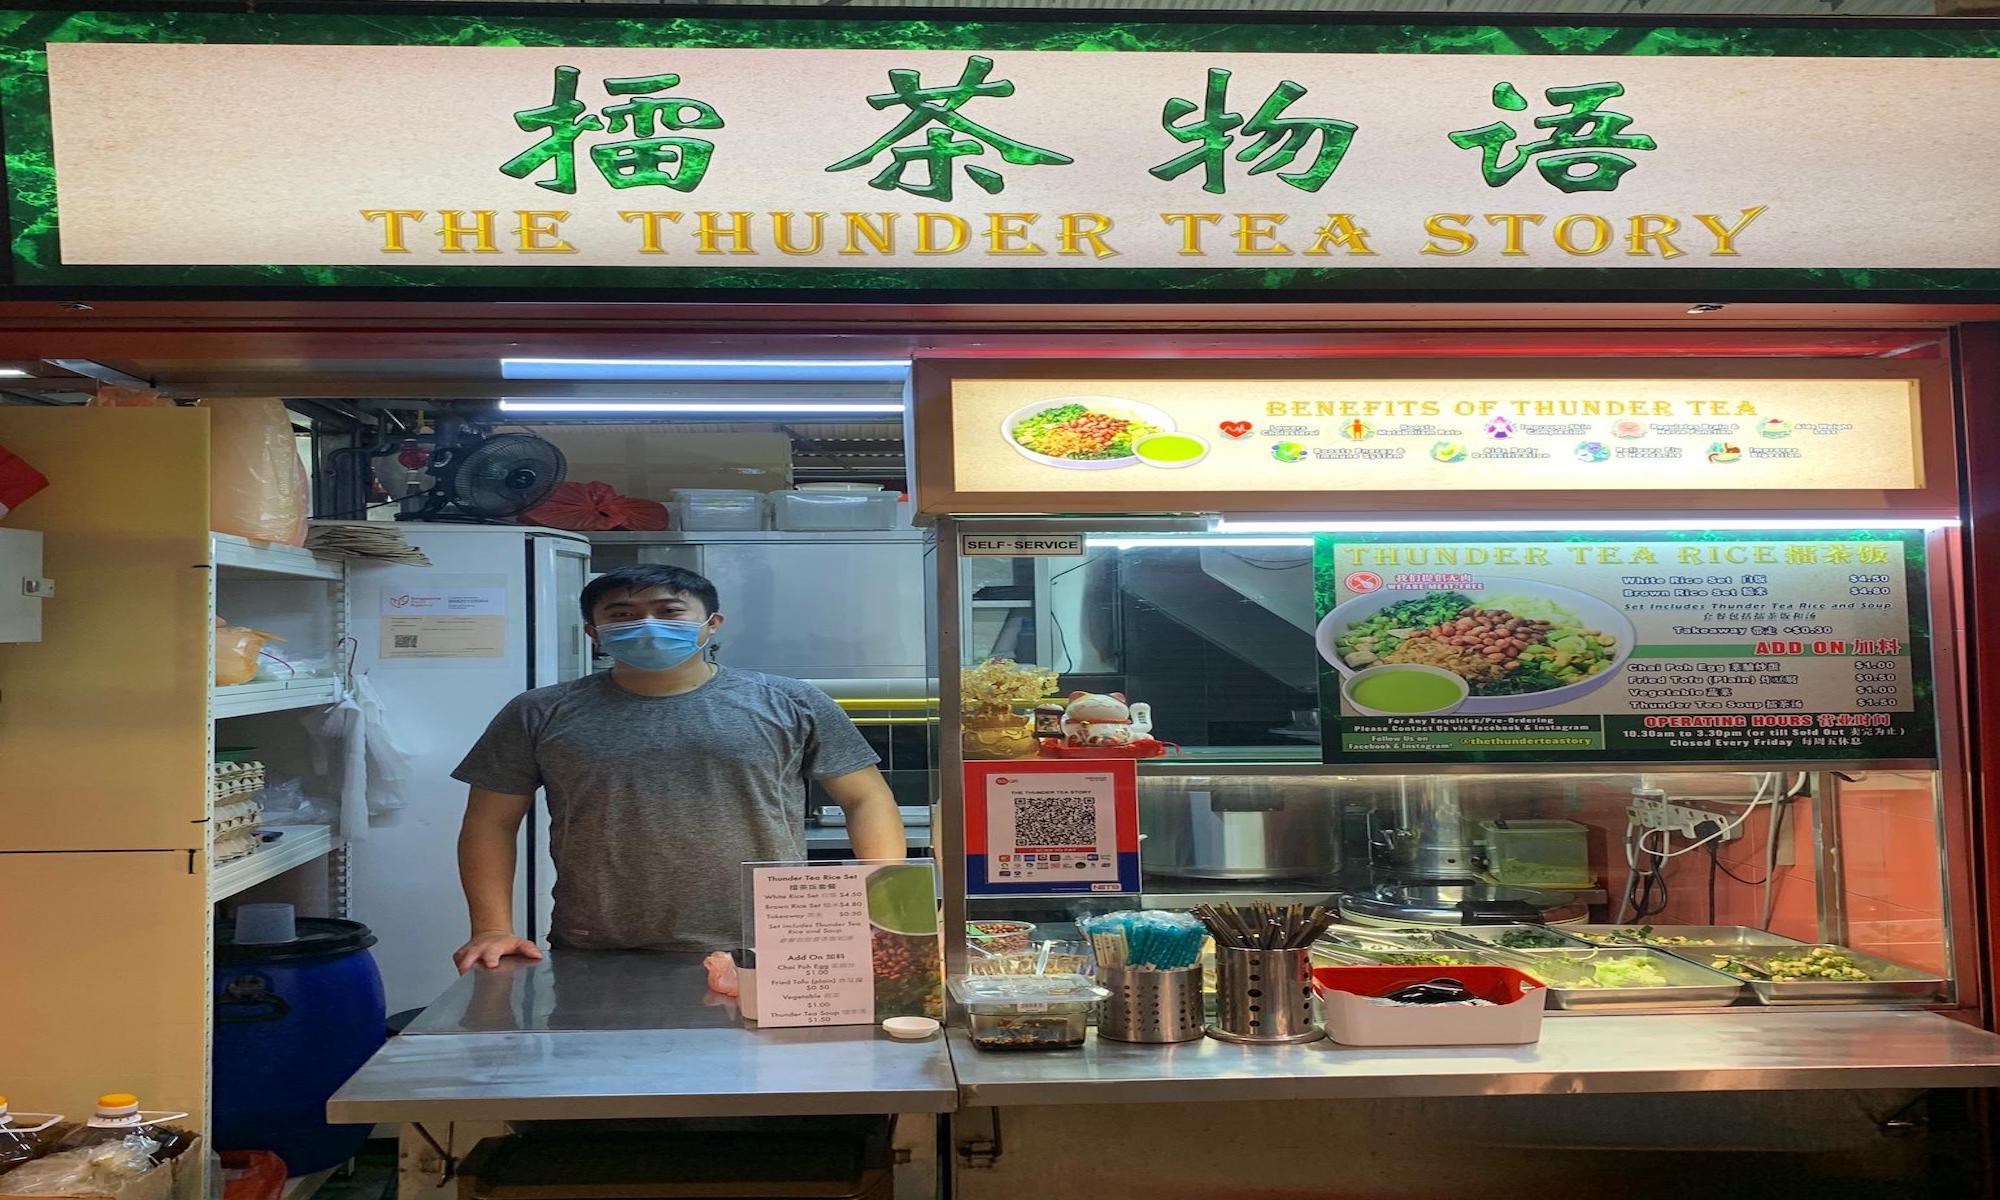 The Thunder Tea Story